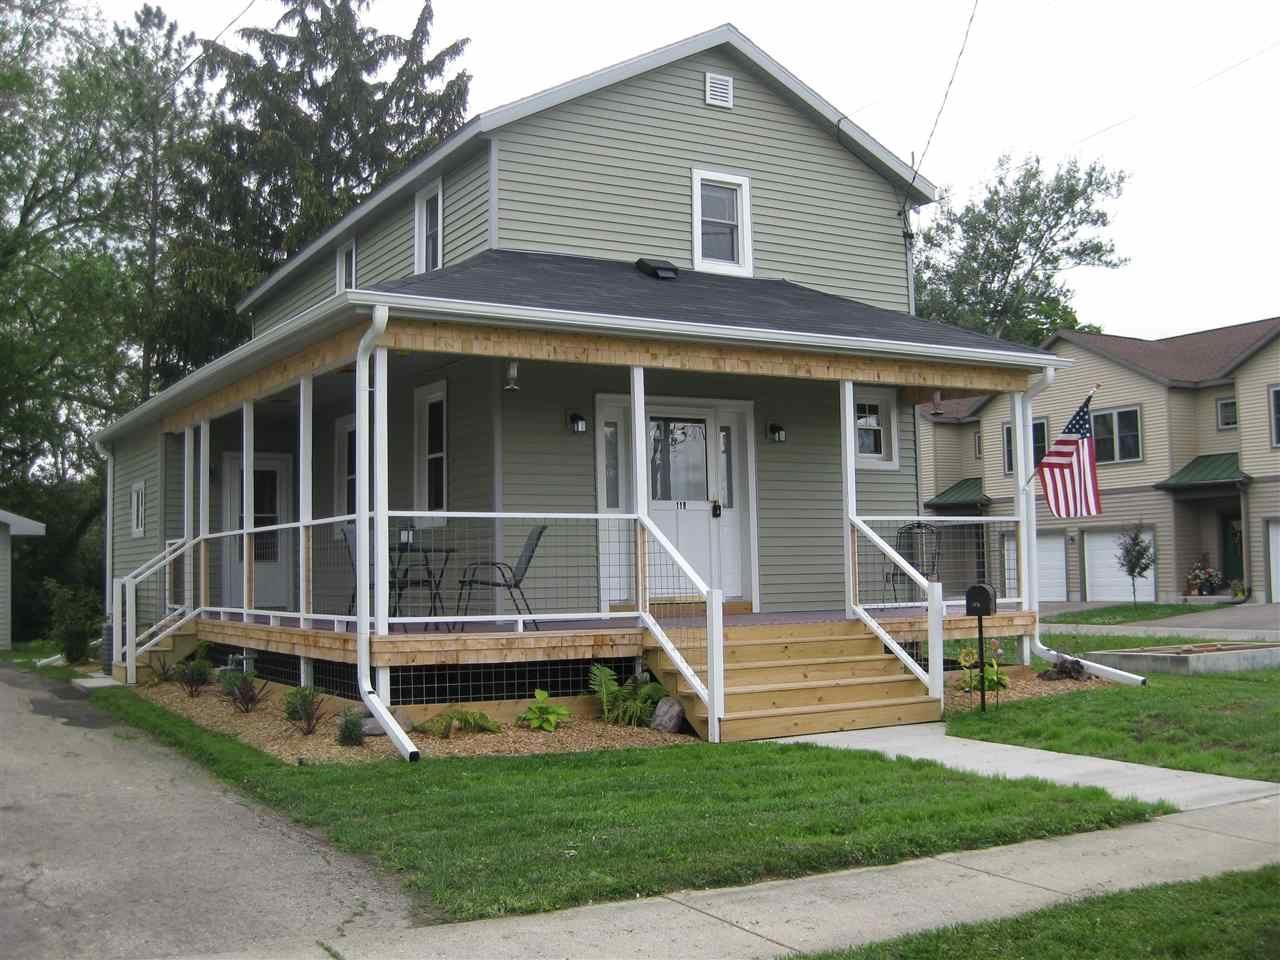 f_1913247 Real Estate in 53534 zip code